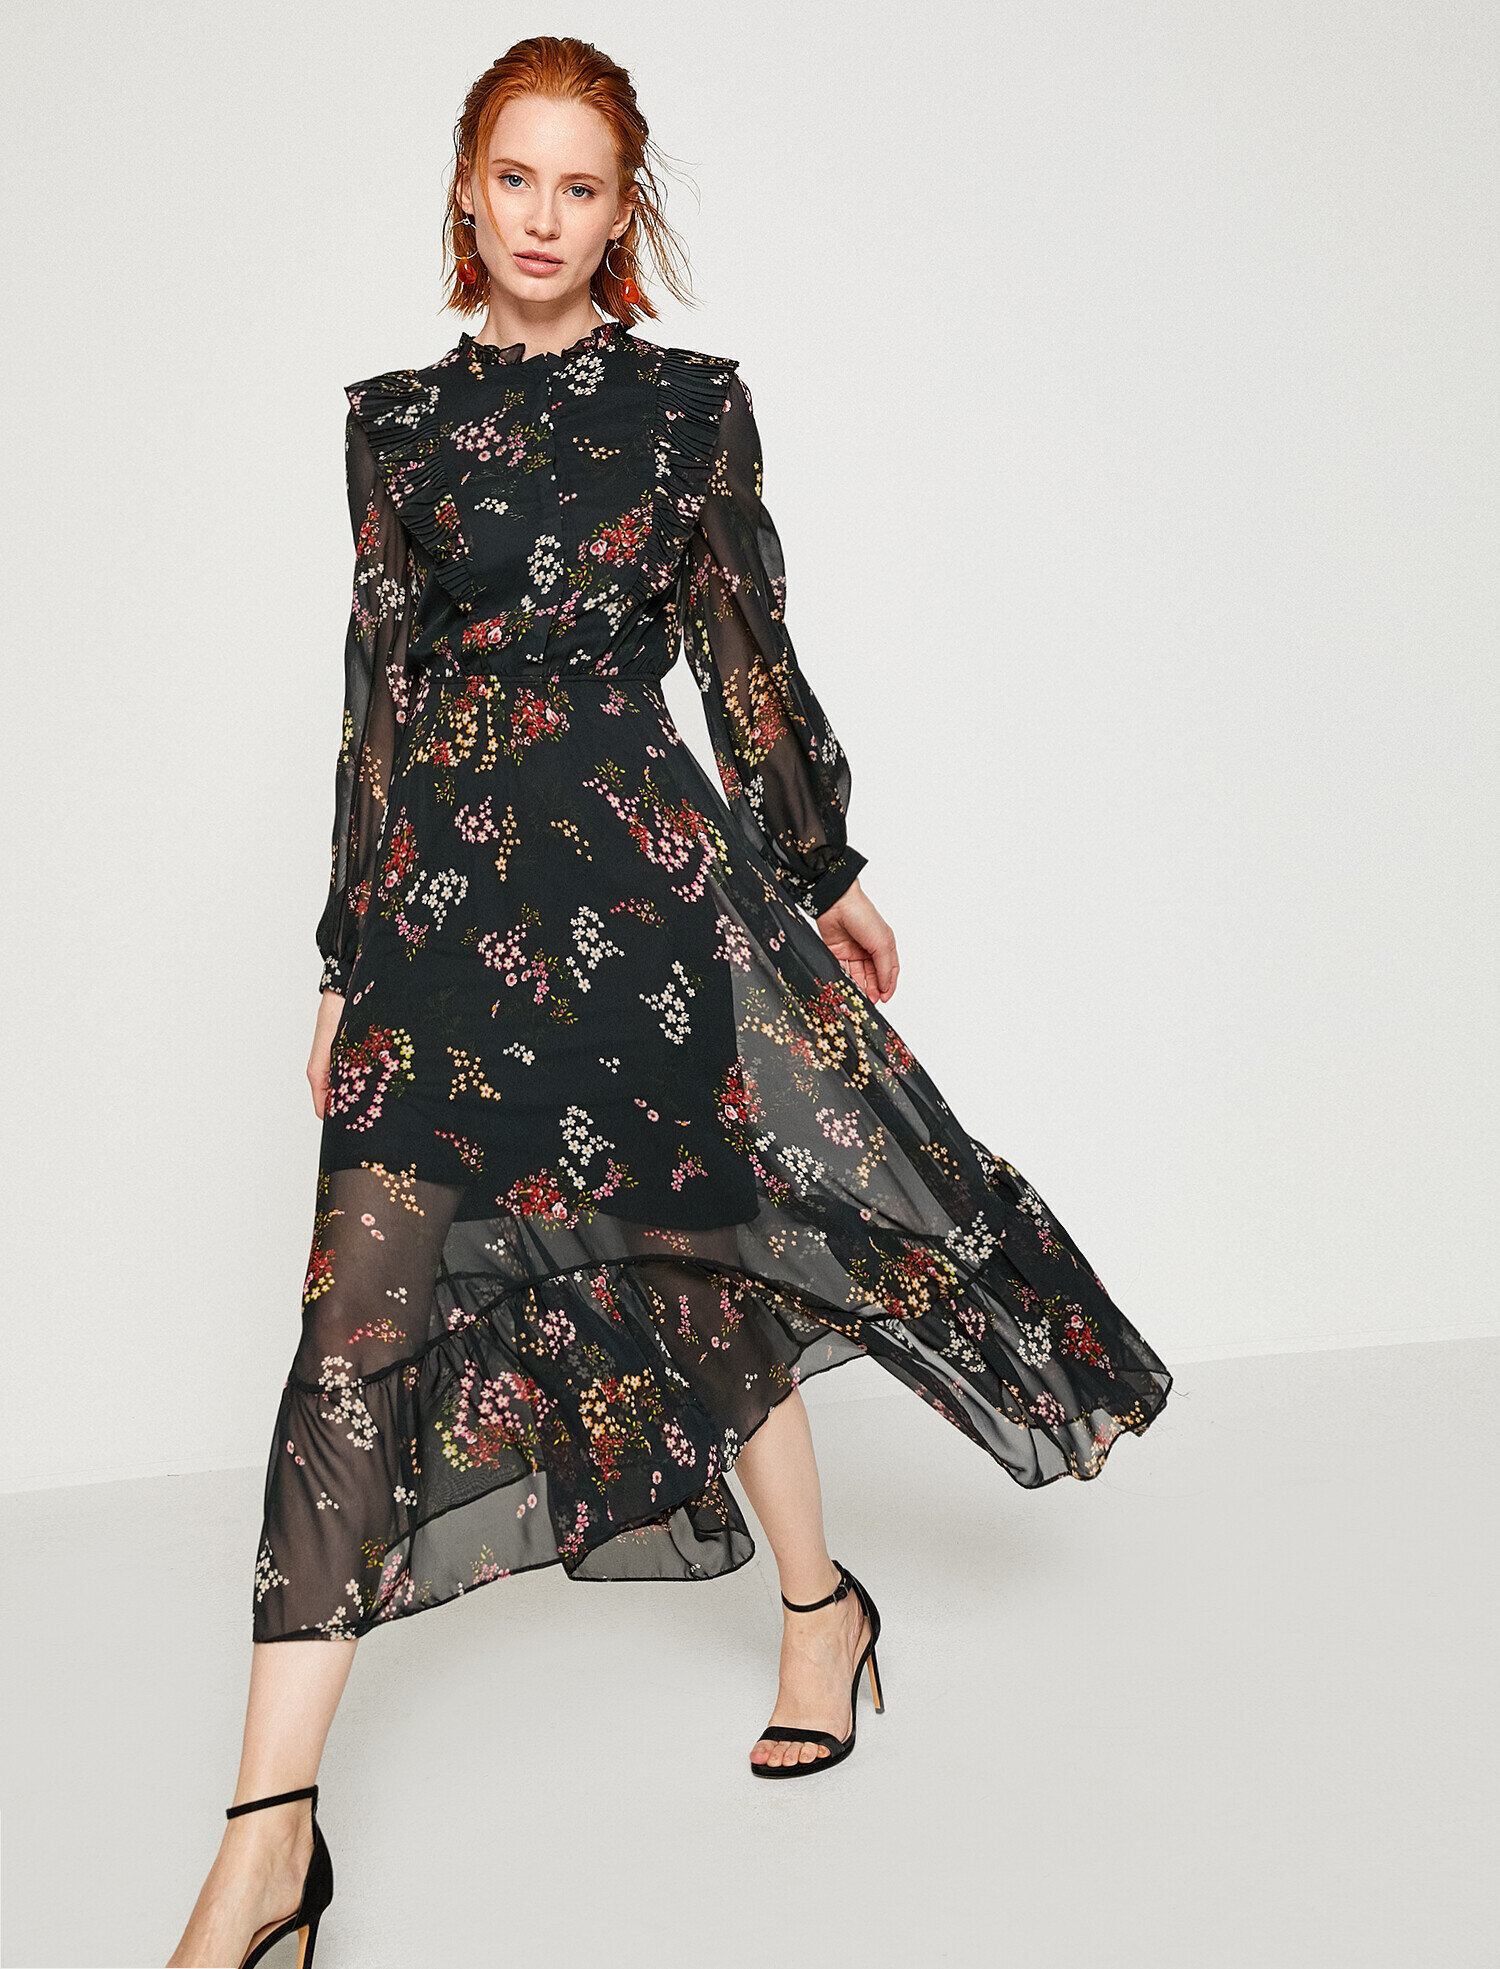 1f1cc5f0fa0d1 Siyah Bayan Çiçekli Elbise 8YAK88396PW07D   Koton